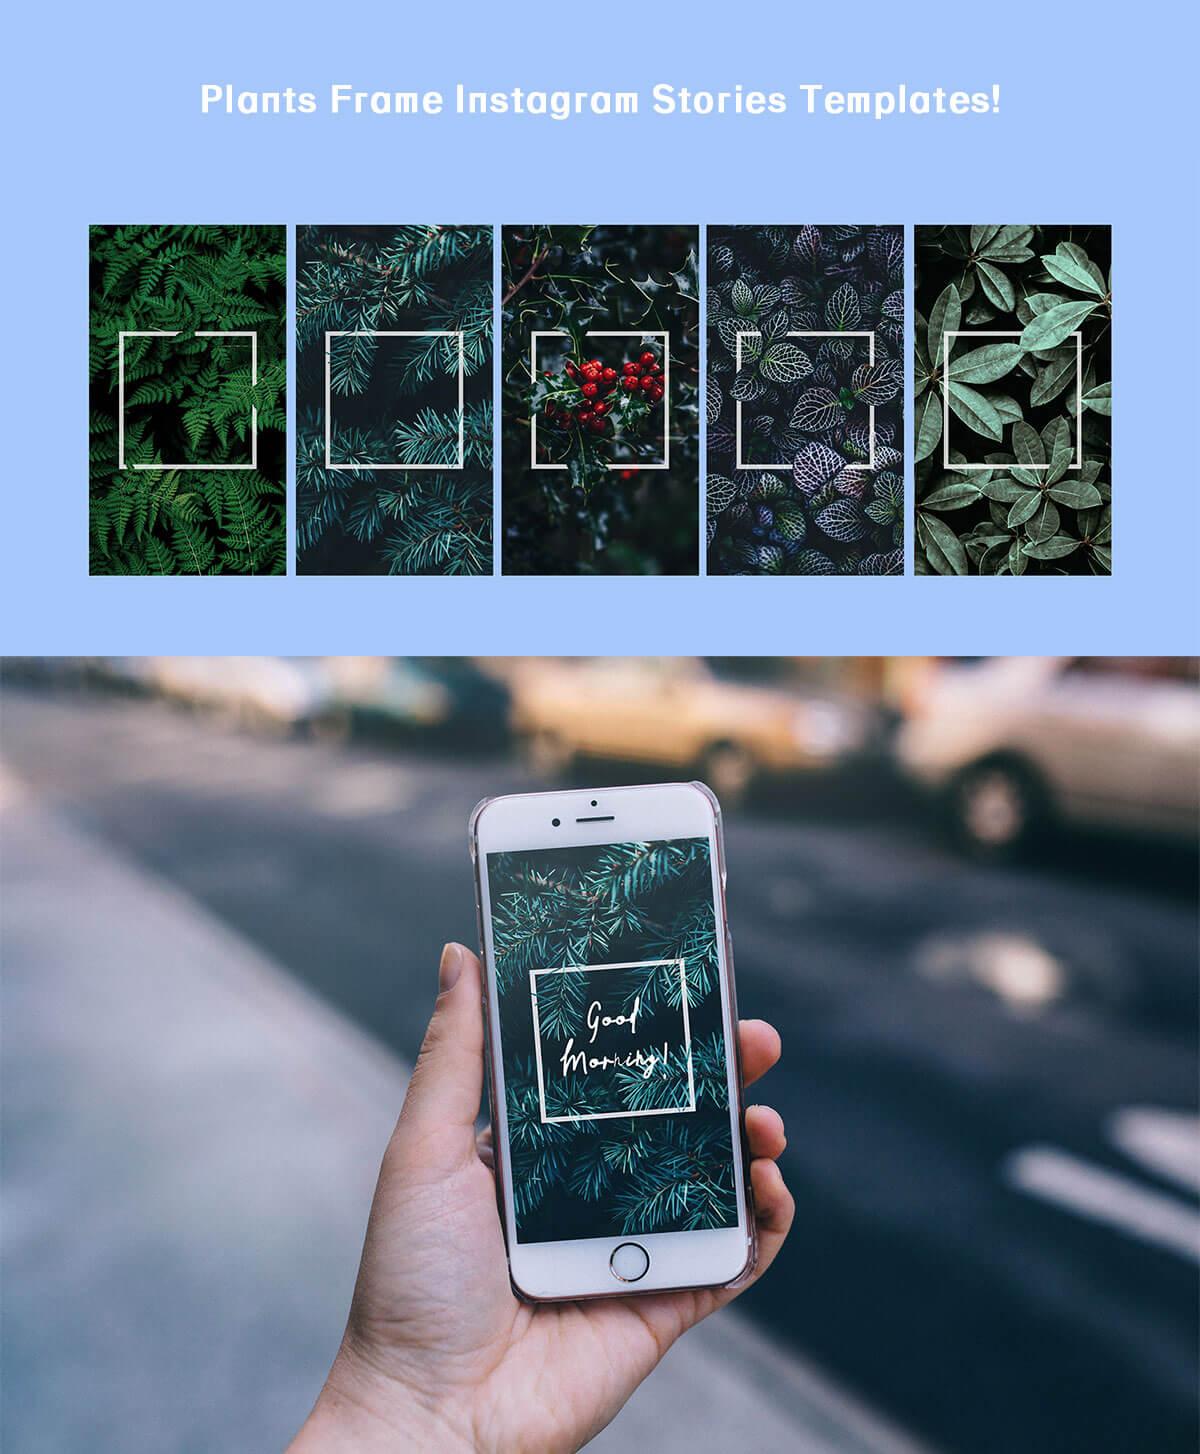 Free Plants Frame Instagram Stories Templates